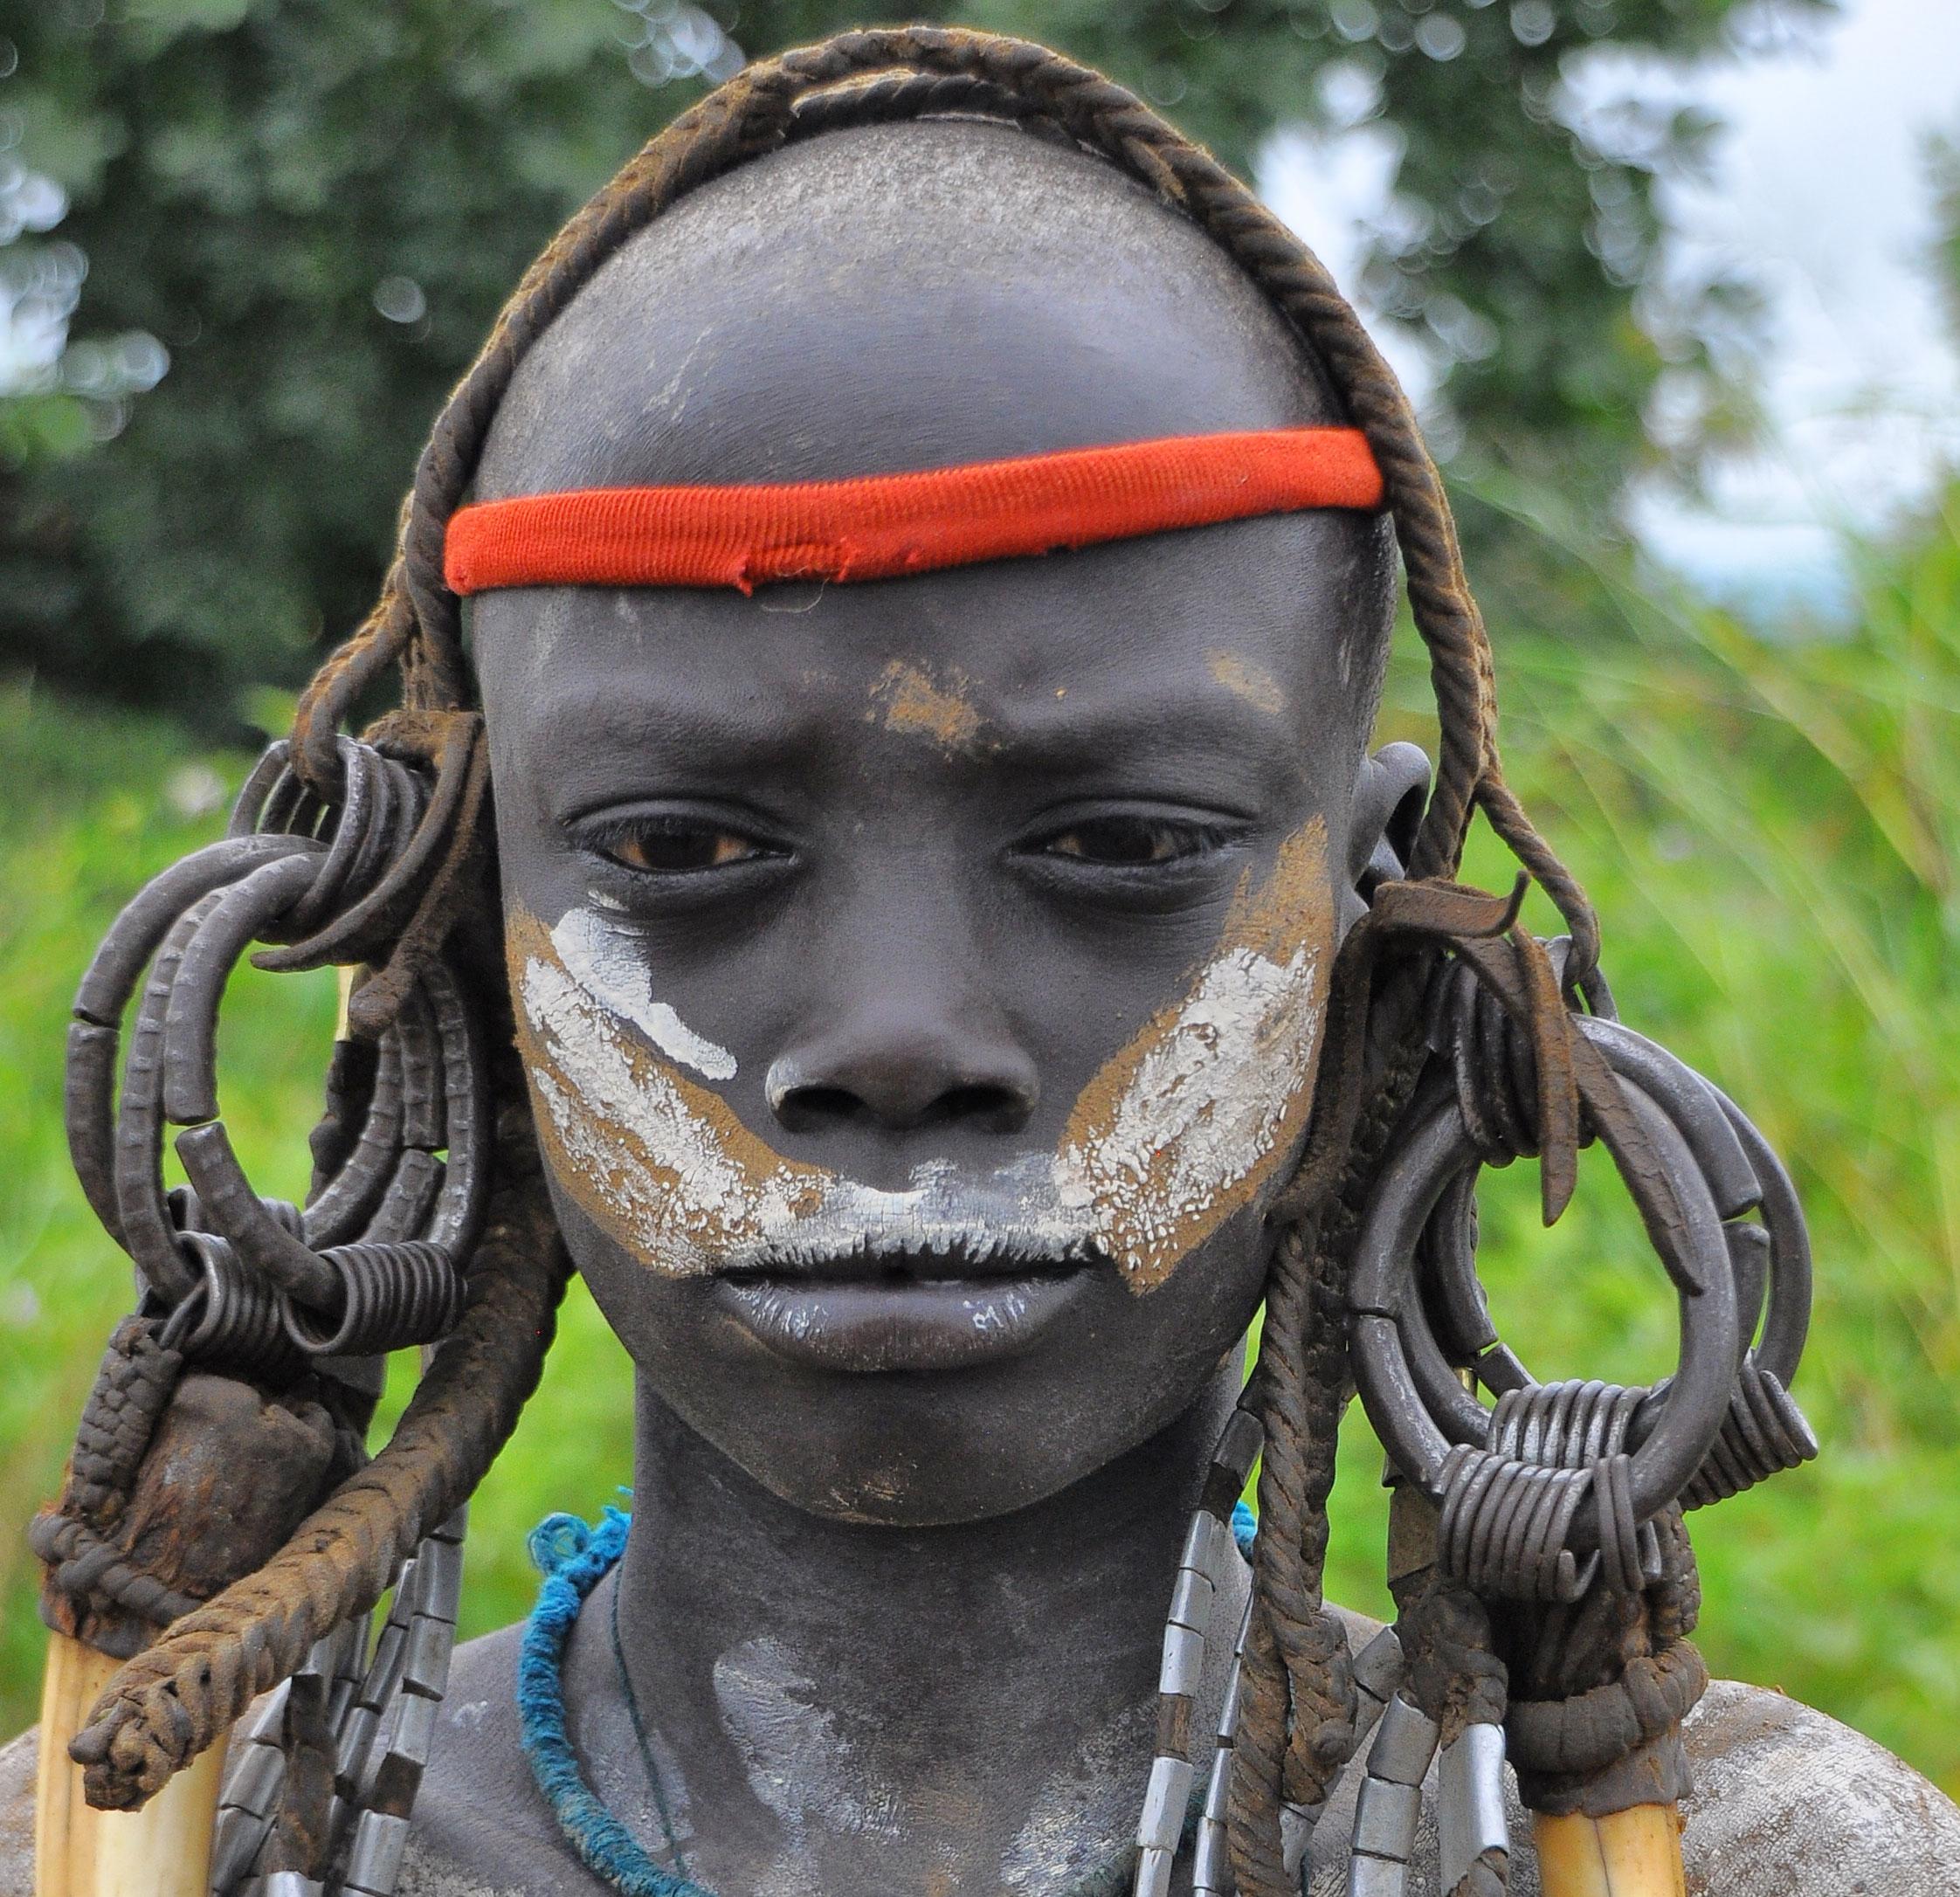 mursi Boy File:Mursi Boy, Ethiopia.jpg